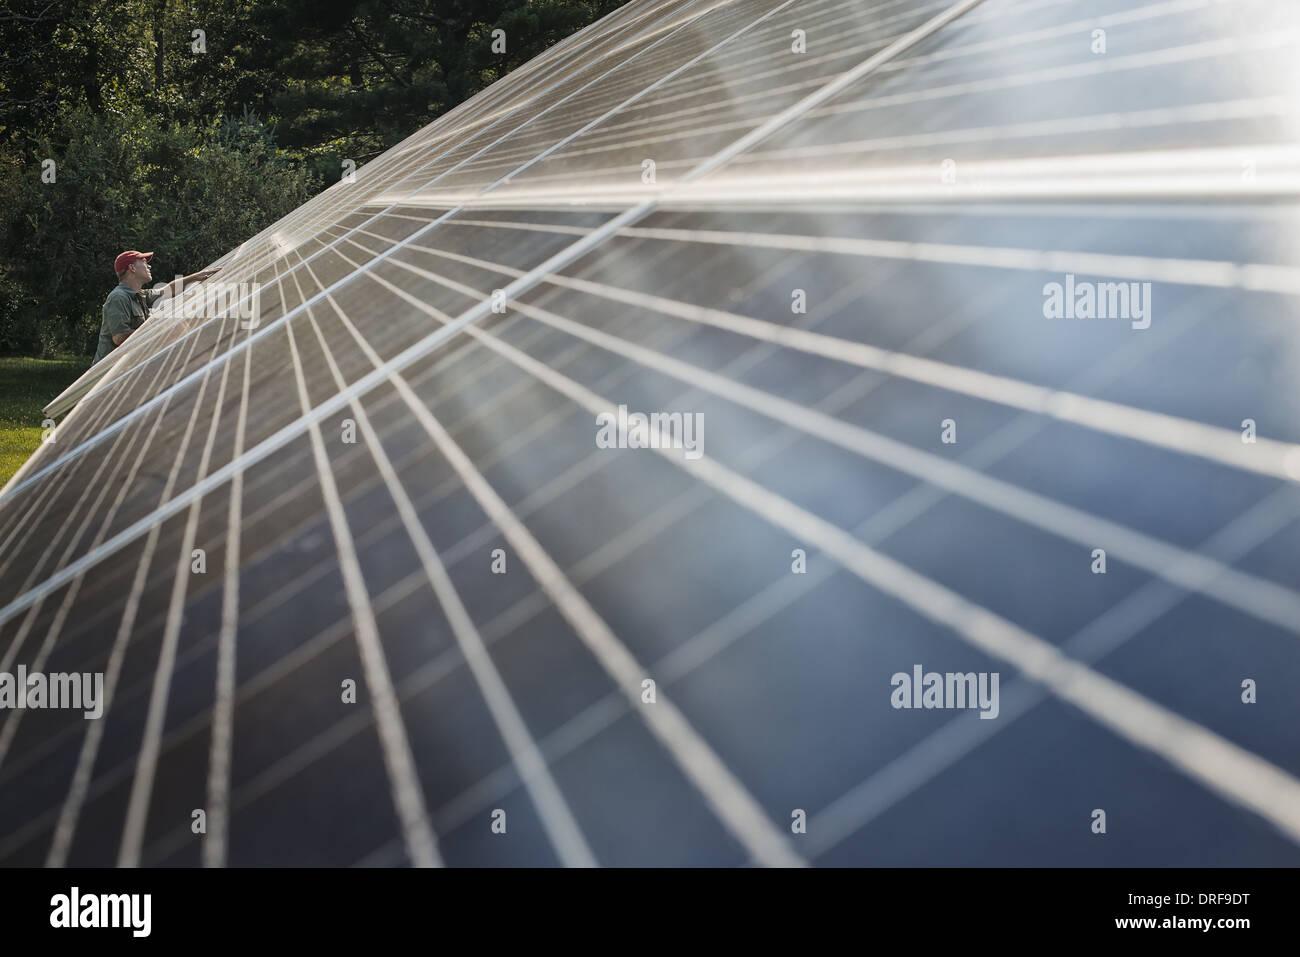 New York state USA man inspecting surface solar panel installation - Stock Image